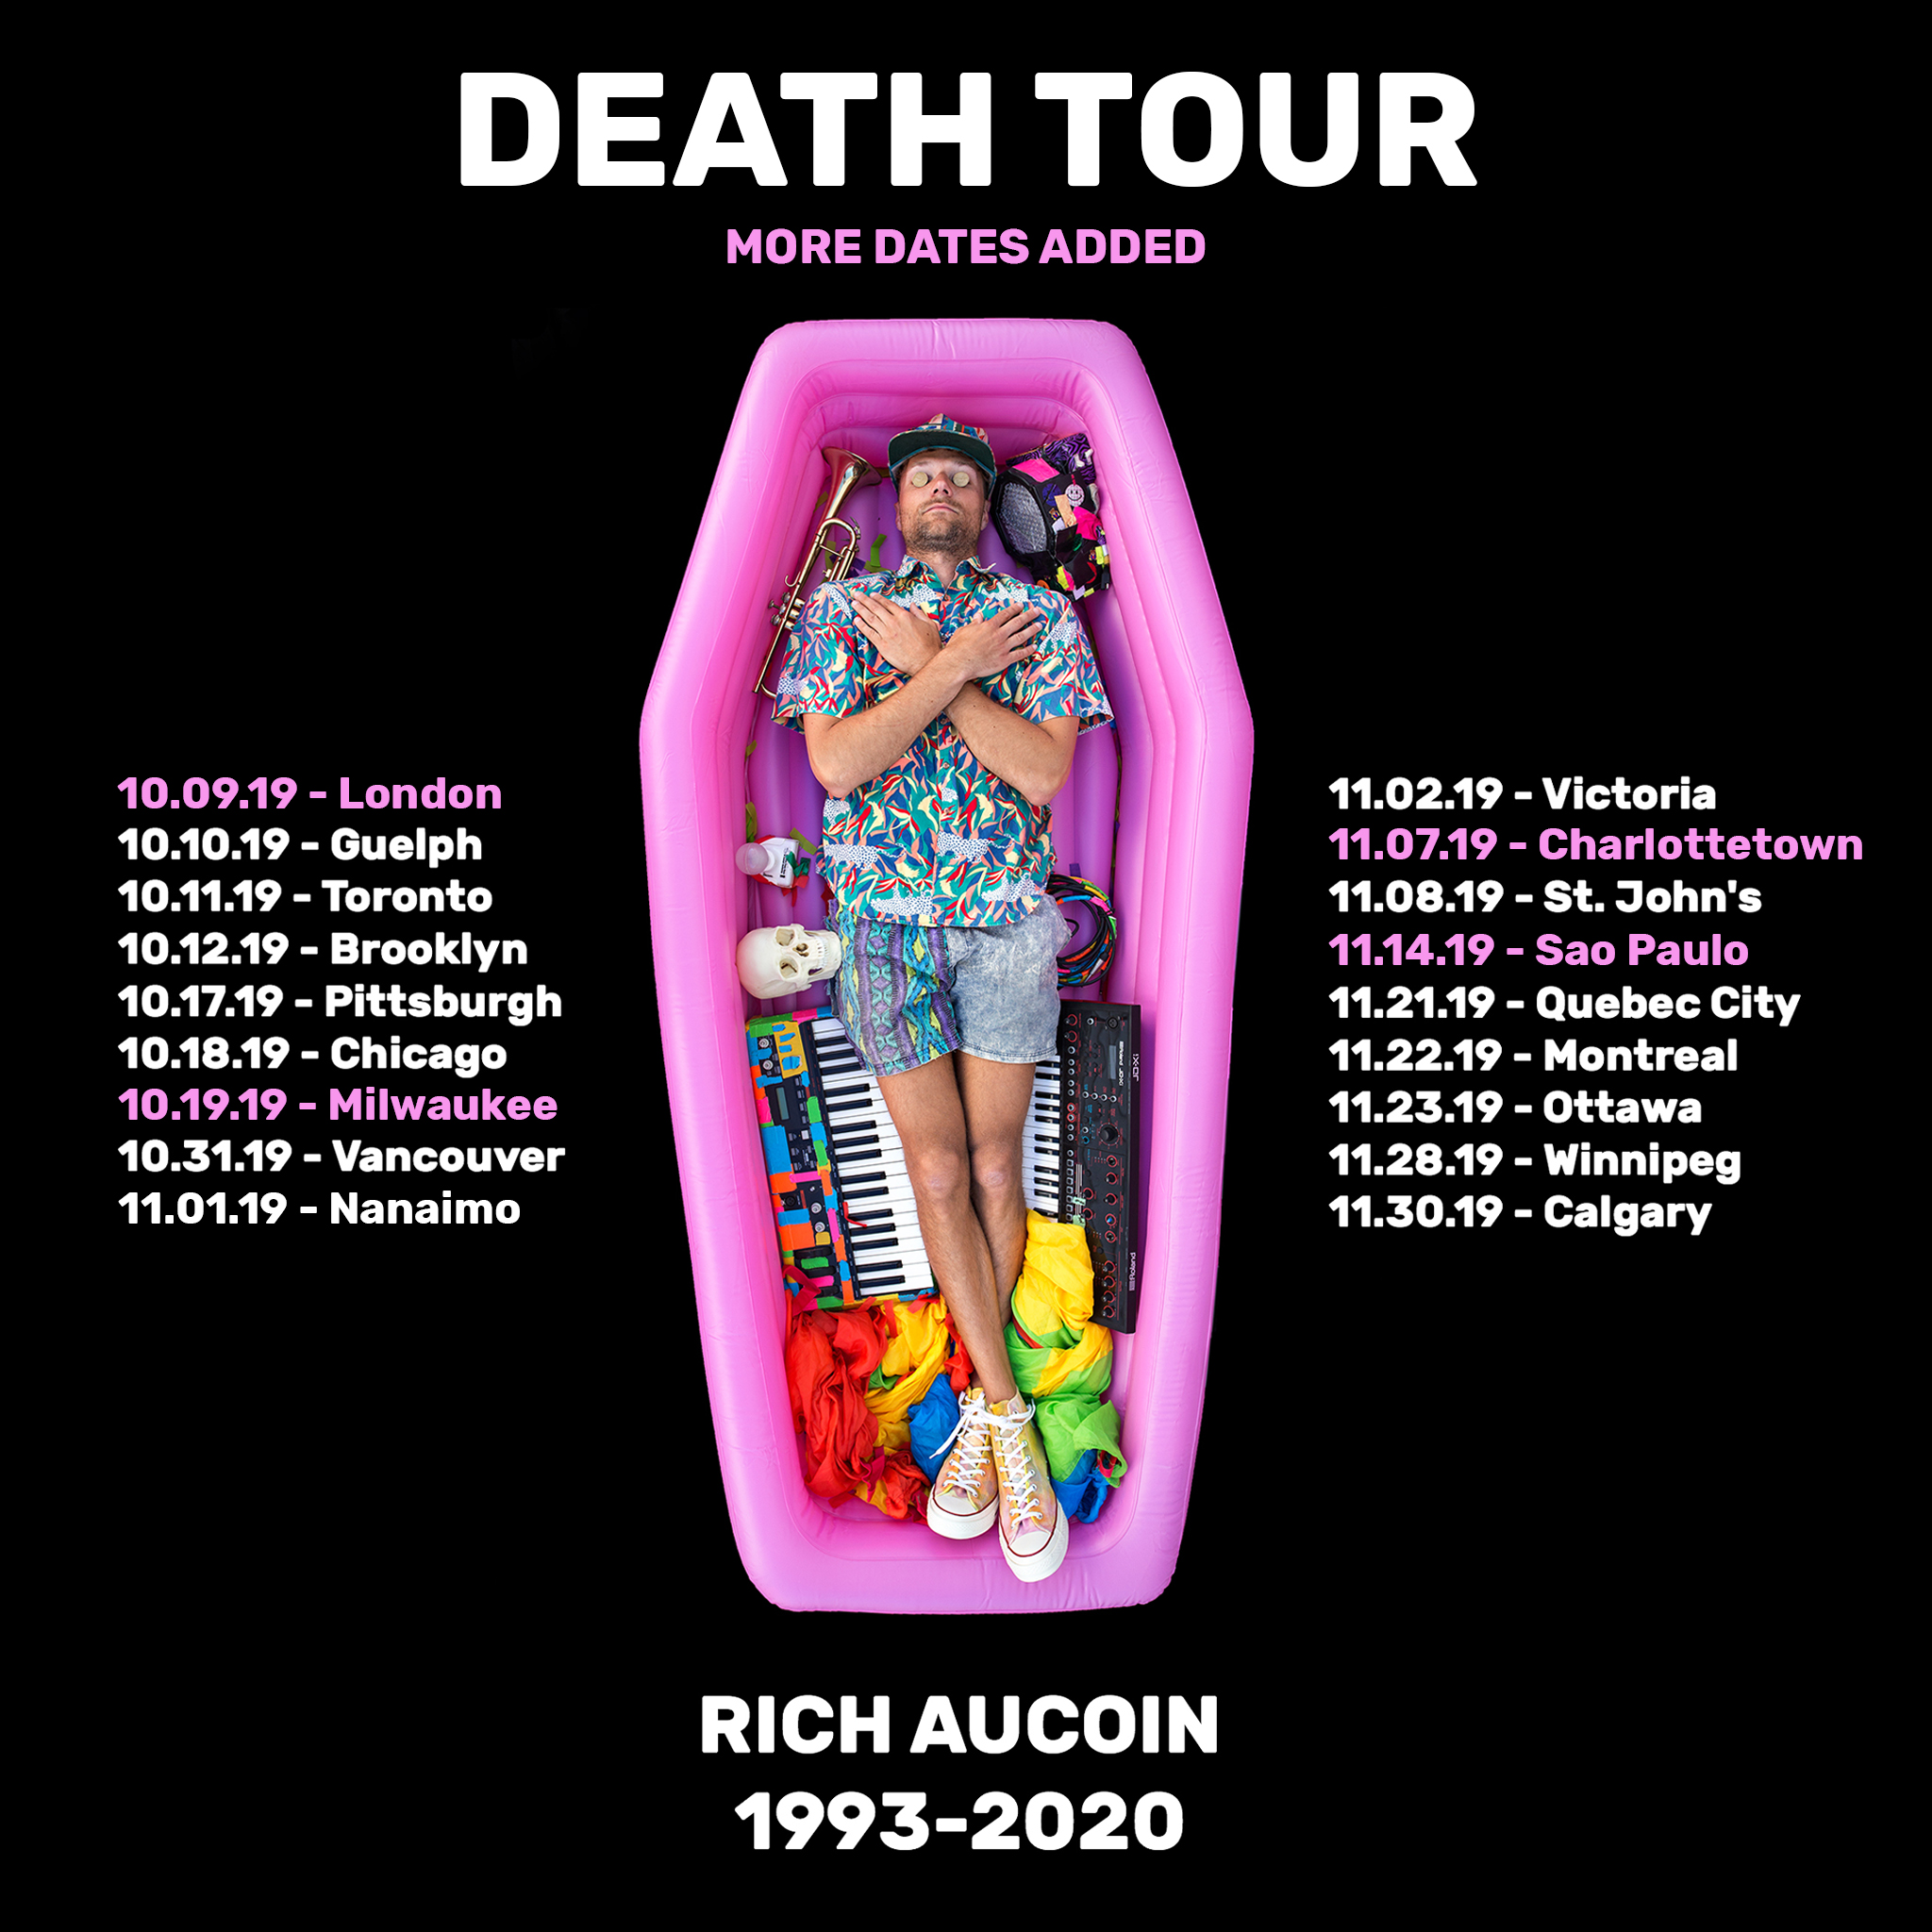 Rich Aucoin Death Tour more dates.jpg